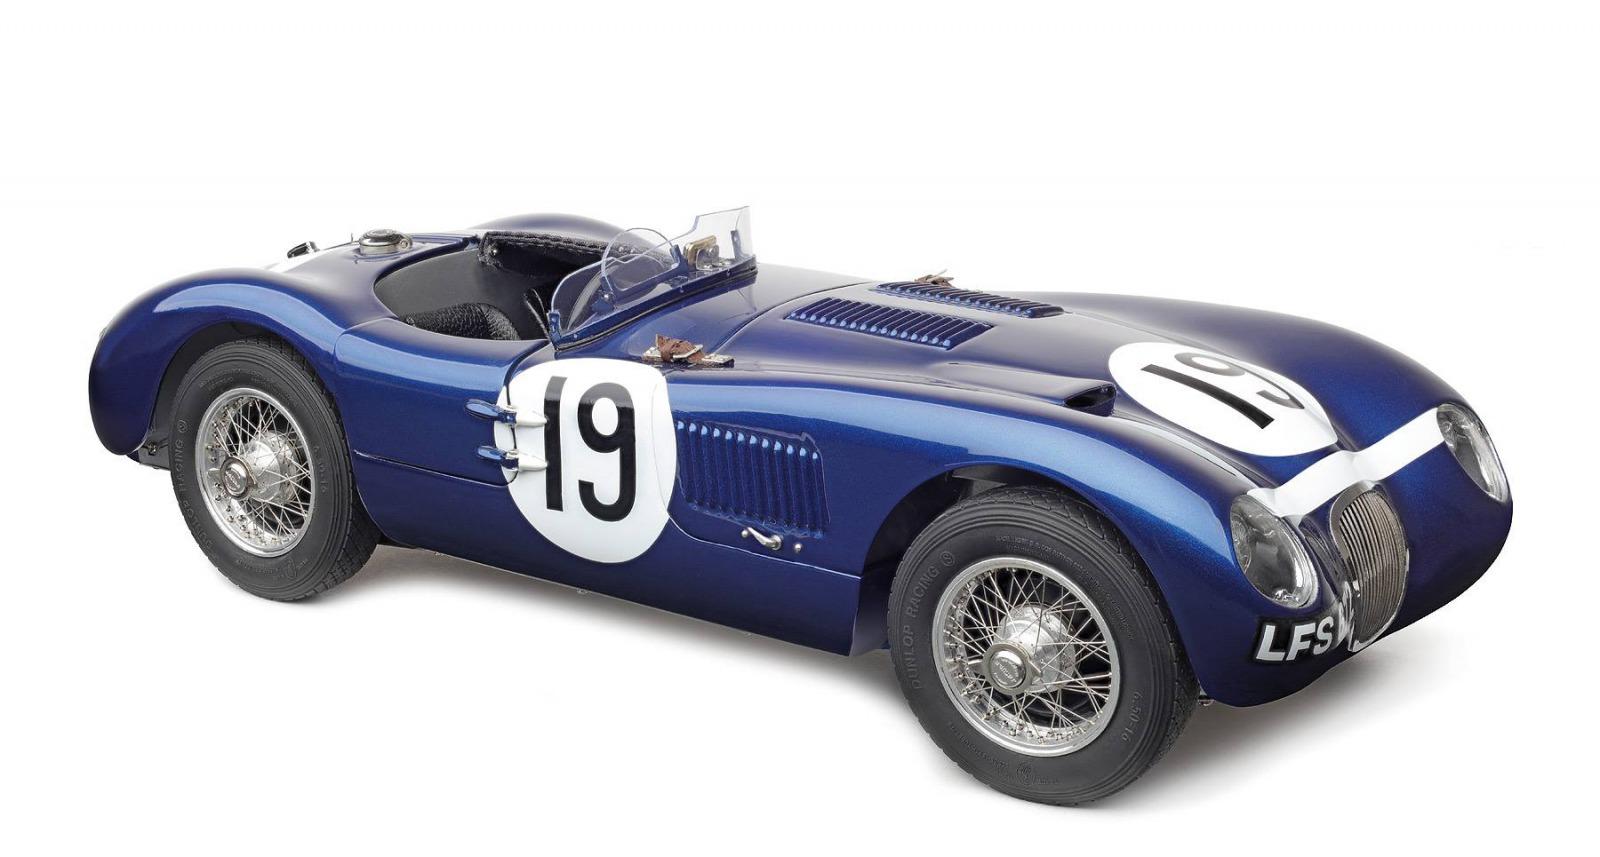 CMC 1/18 ミニカー ダイキャストモデル 1953年モデル ジャガー C Type1953 Jaguar C Type 1:18 CMC